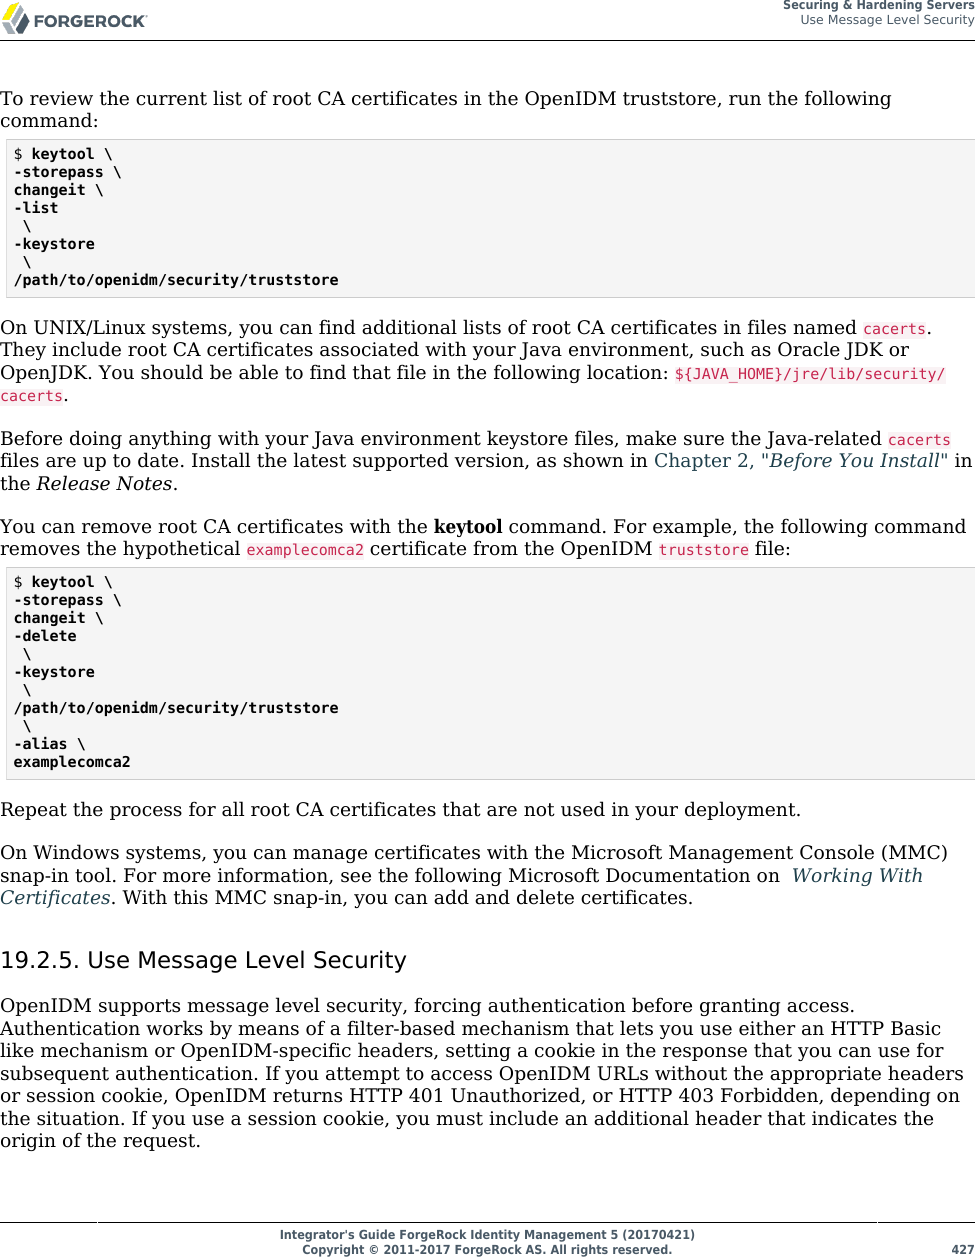 Integrator's Guide ForgeRock Identity Management 5 IDM Integrators